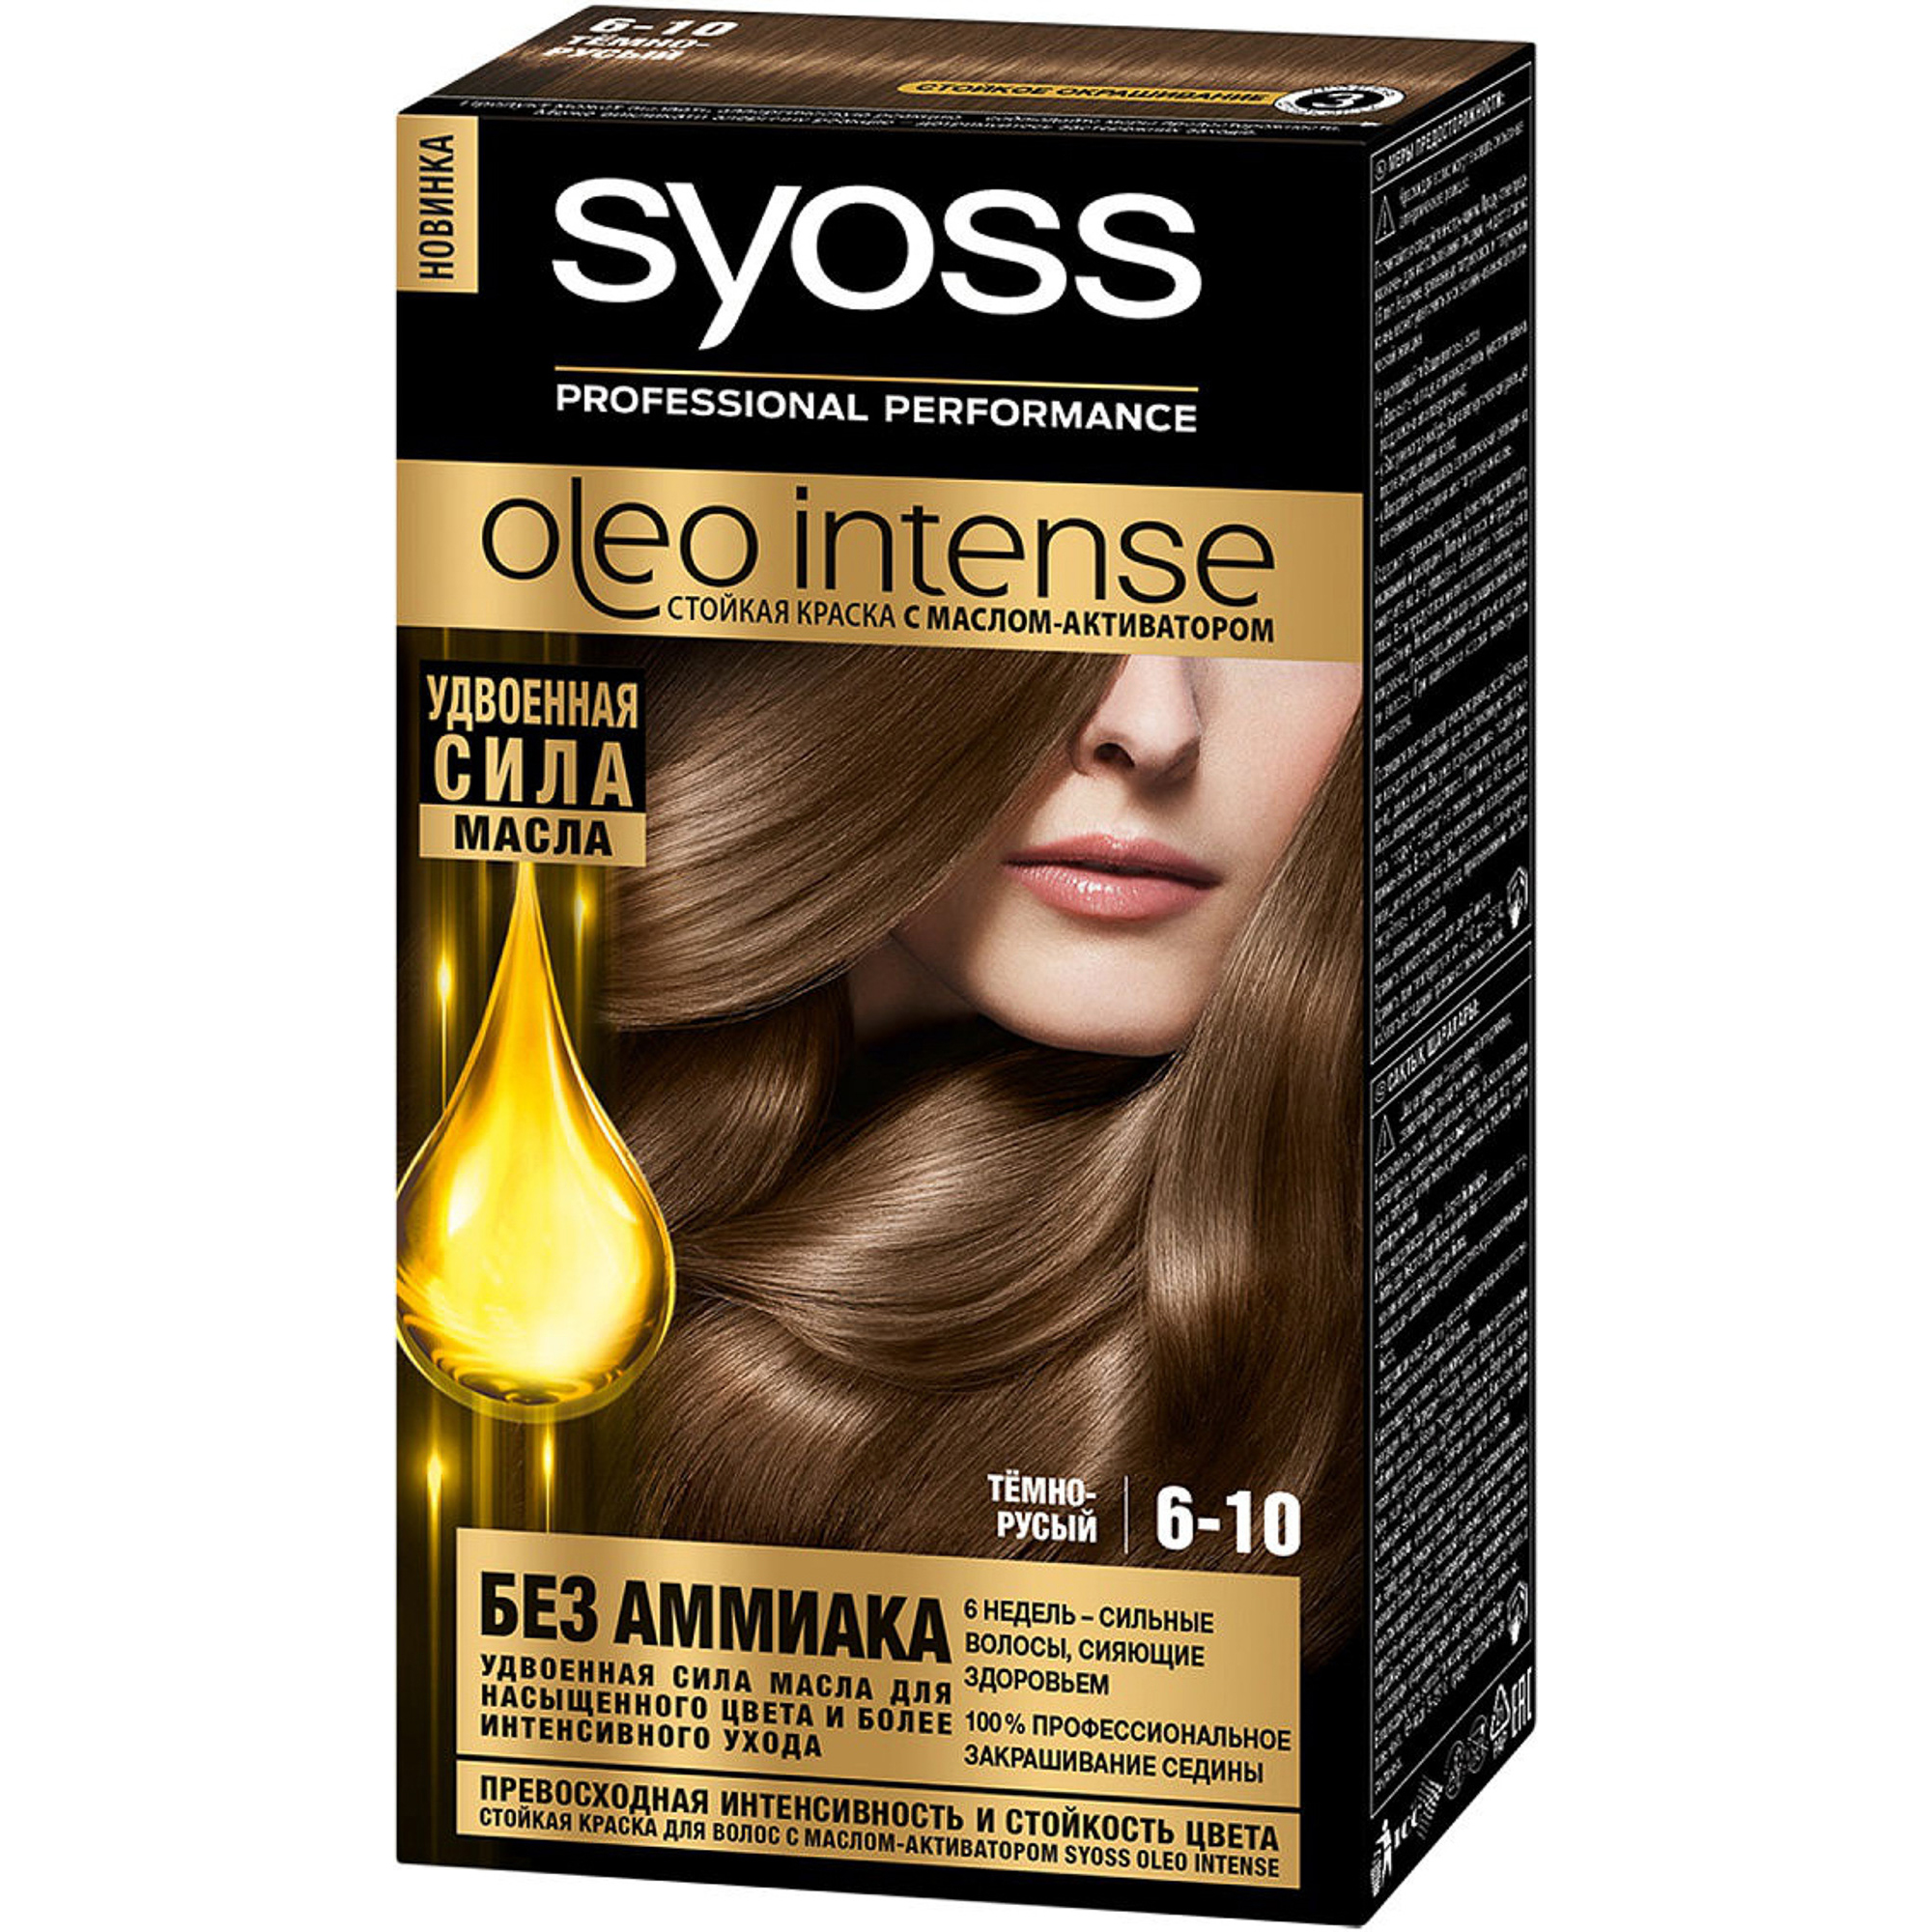 Краска для волос Syoss Oleo Intense 6-10 Темно-русый syoss oleo intense краска для волос 6 10 тёмно русый 50мл